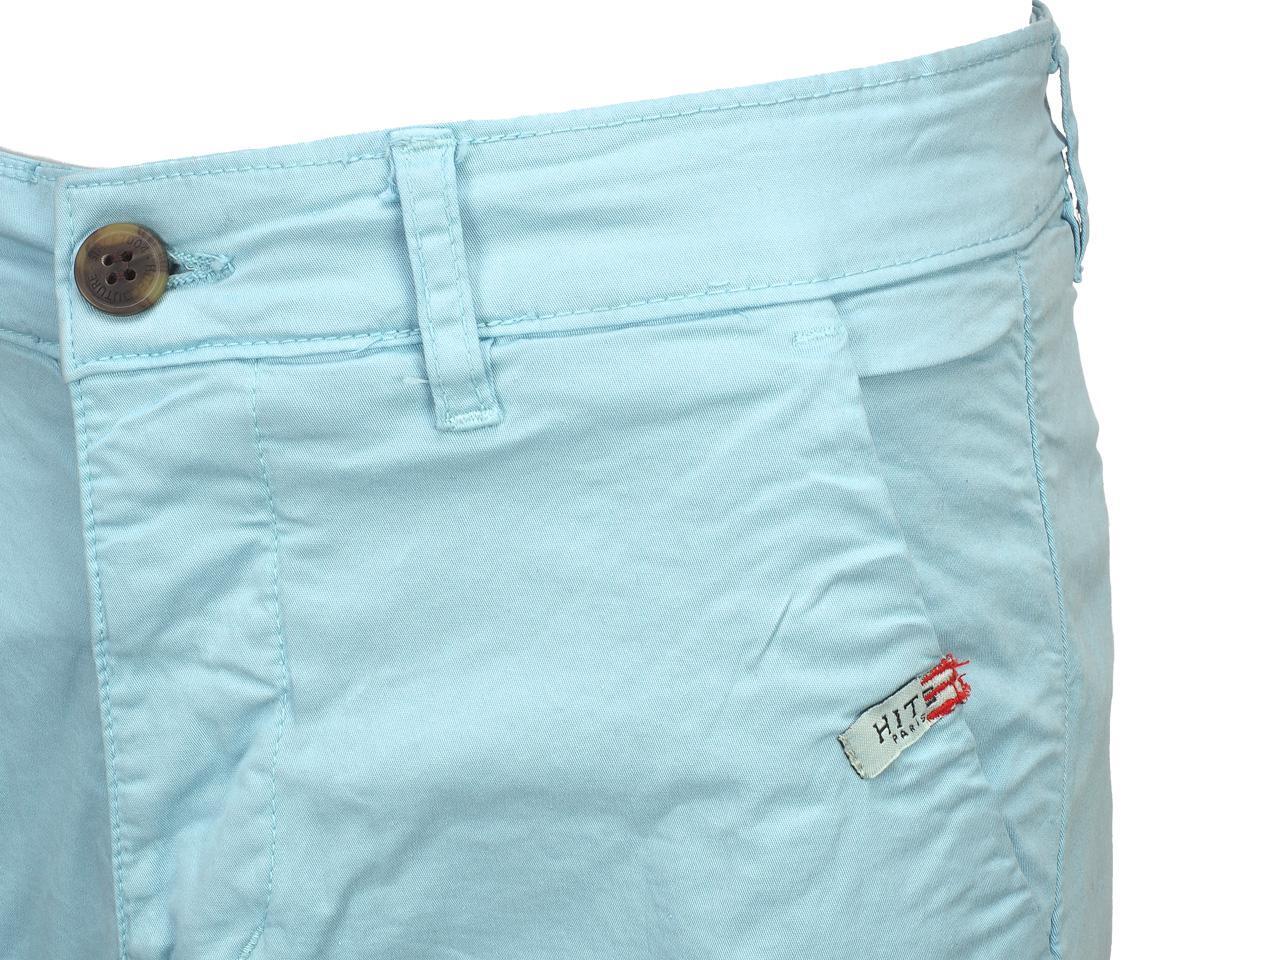 Bermuda-Shorts-Hite-Couture-Vobier-Sky-Bermuda-Chino-Blue-11597-New thumbnail 3